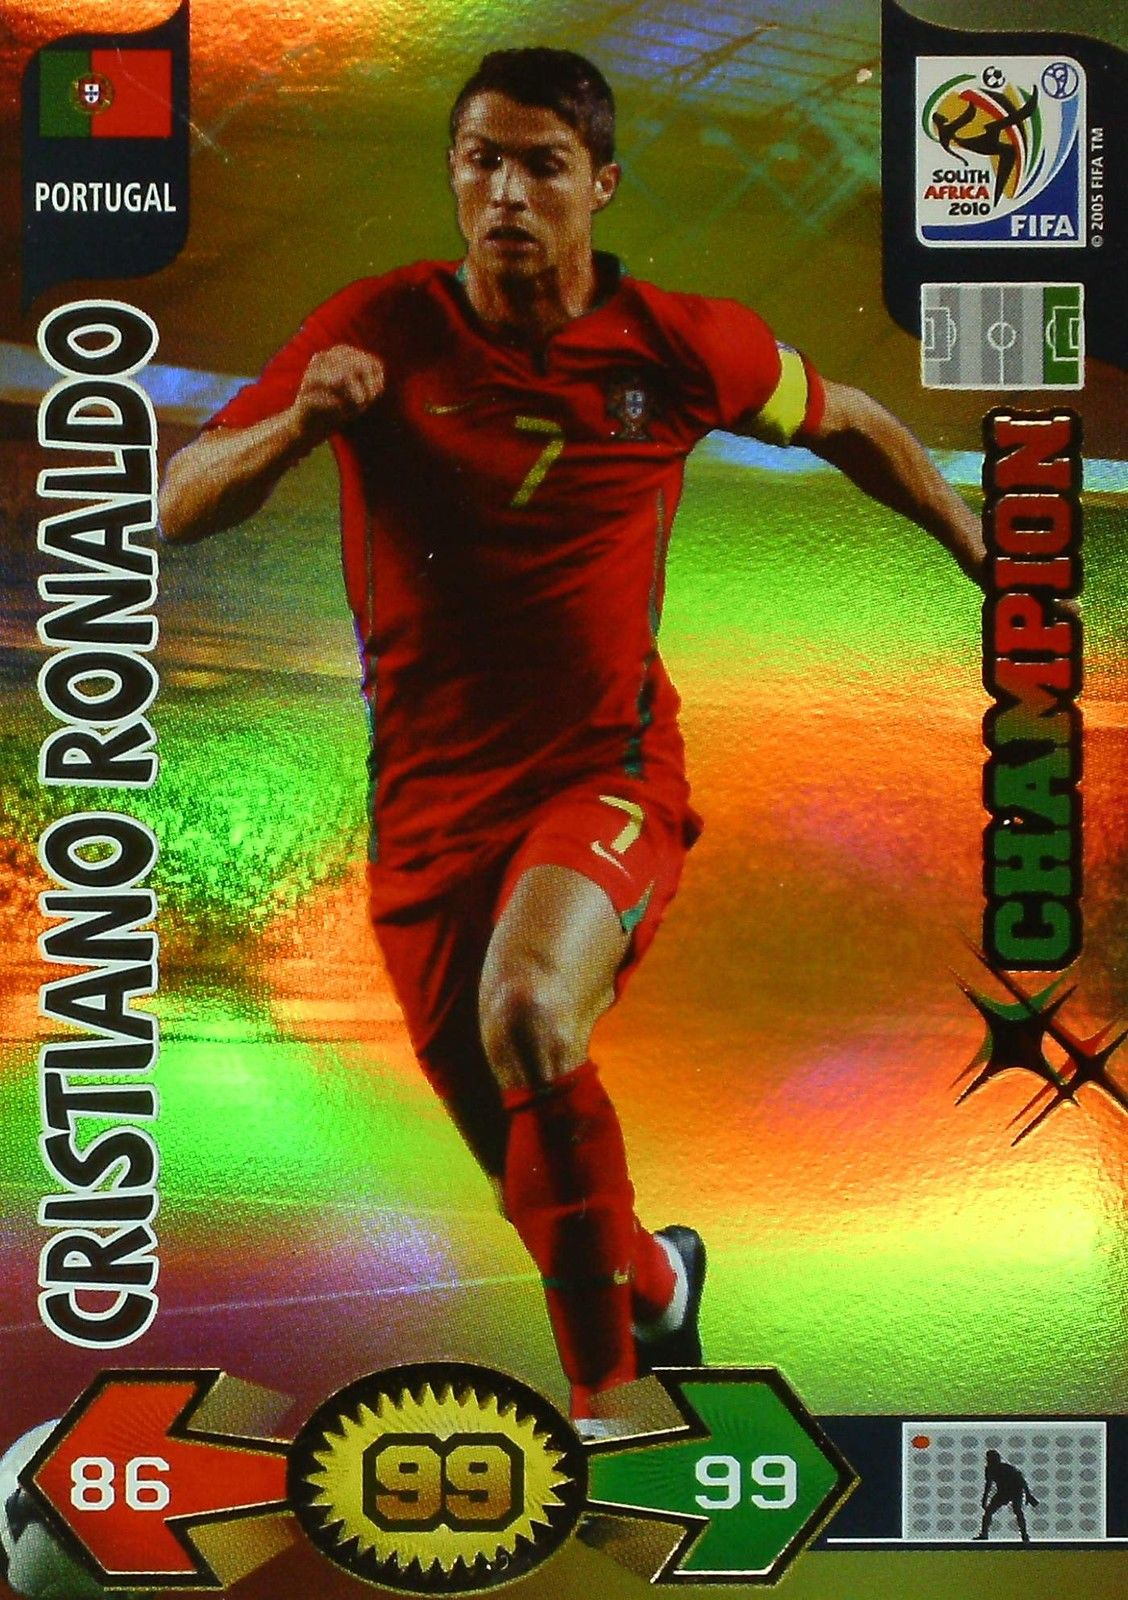 Panini Adrenalyn XL FIFA World Cup 2010 tarjetas comerciales Sudáfrica ** ** Tarjeta de Pick